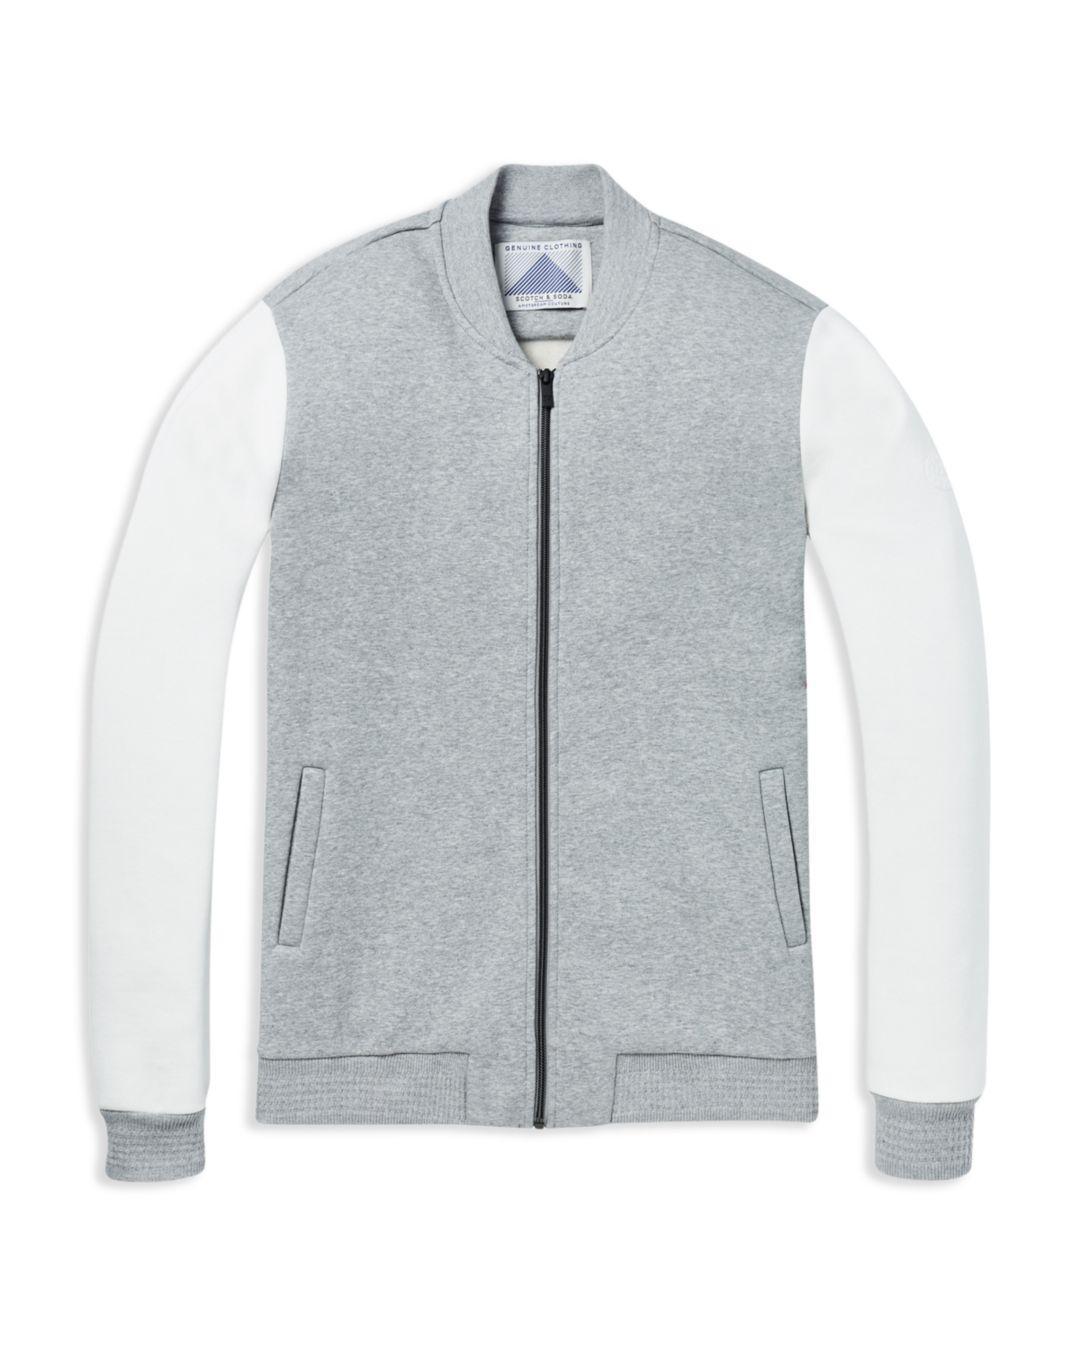 65a0a94ce Scotch & Soda Gray Color-block Sweatshirt Bomber Jacket for men